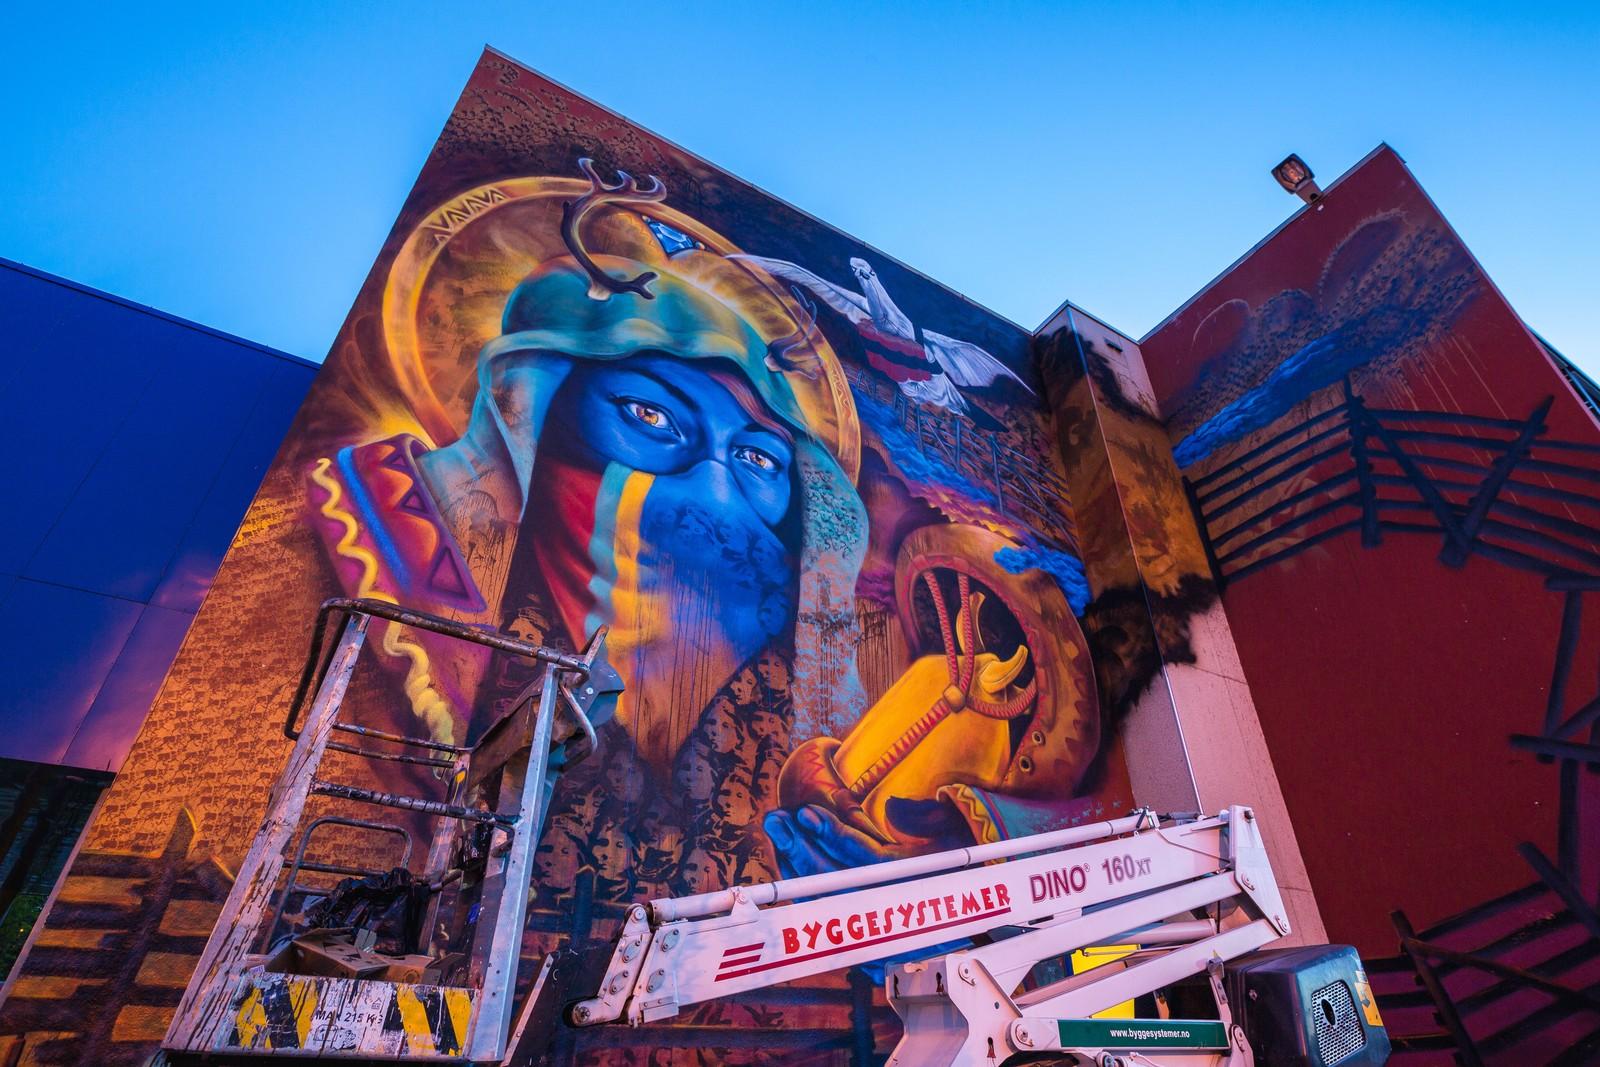 Den ferdige graffitien preger en stor vegg på ungdomskolen i Alta.